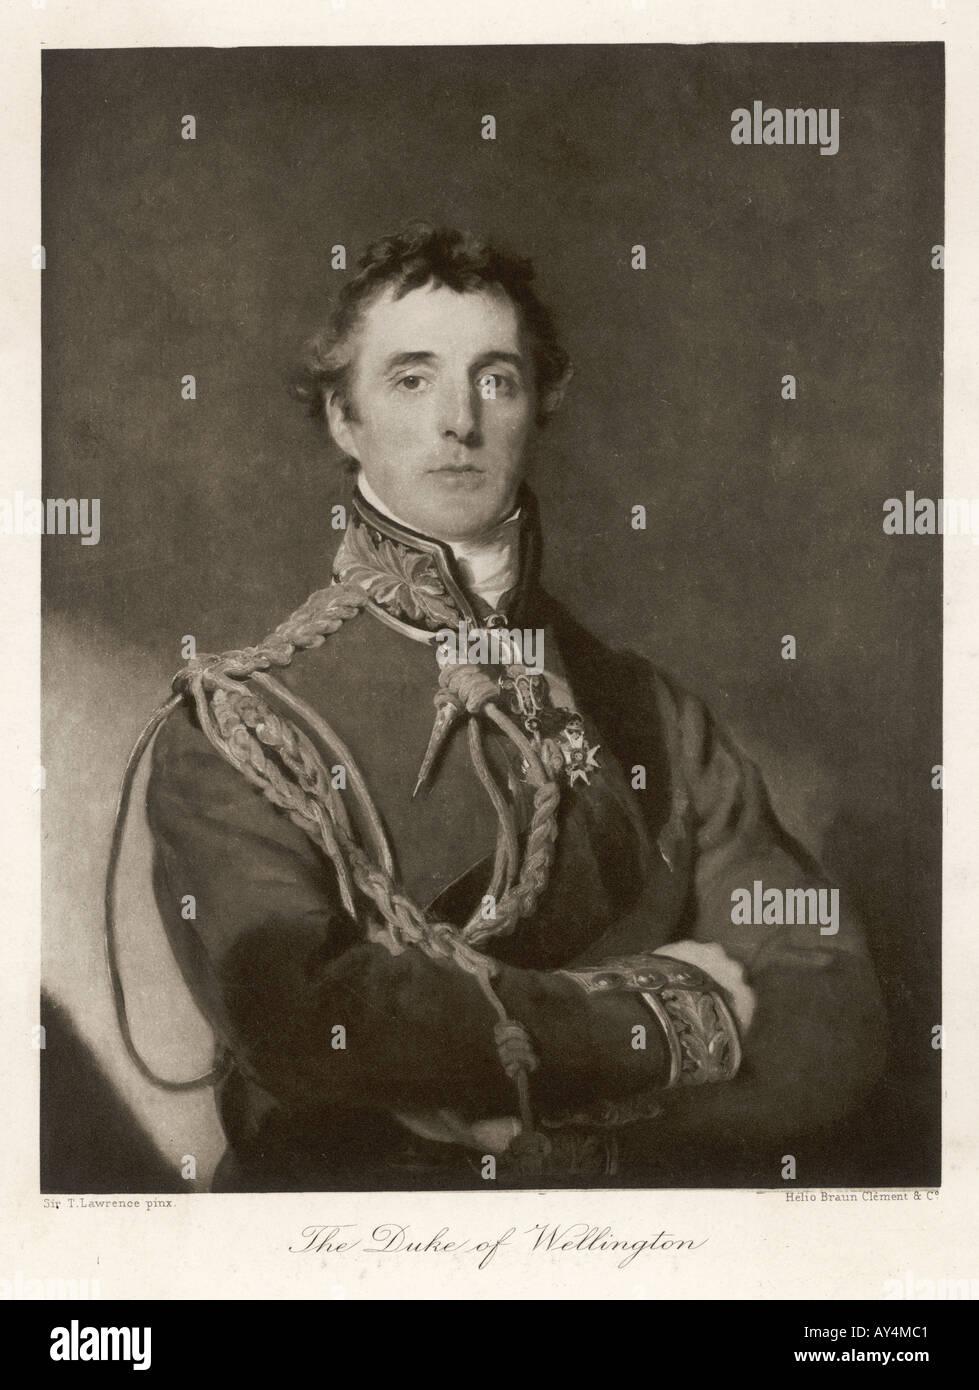 Duke Wellington Lawrence - Stock Image